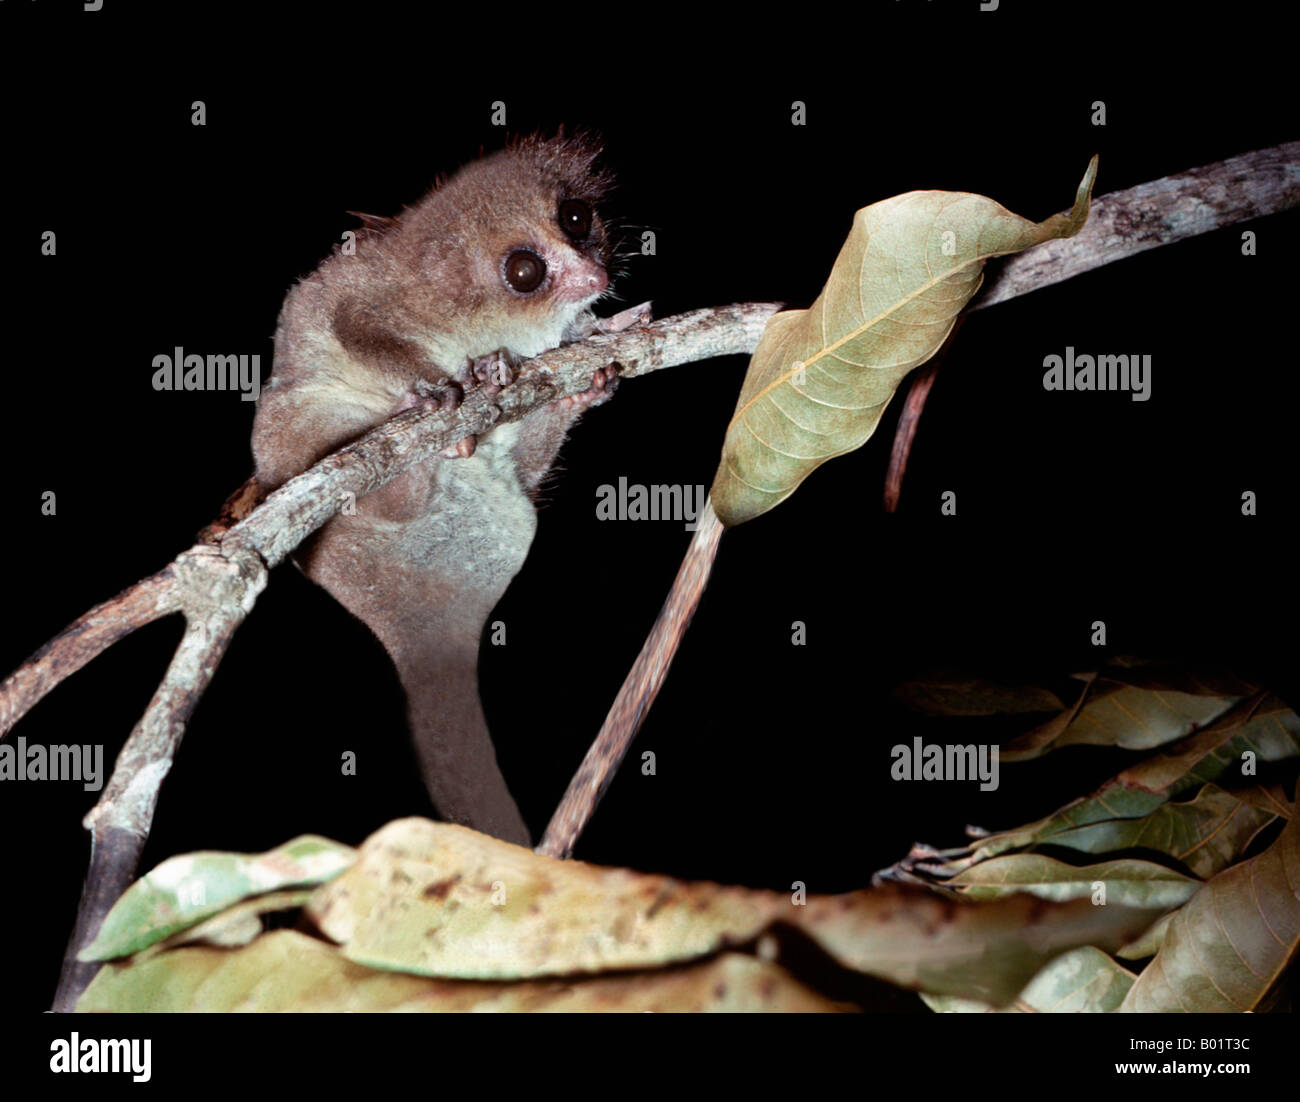 allocebe cheirogale aux oreilles velues allocebus trichotis hairy eared dwarf lemur madagascar affen halbaffen lemuren